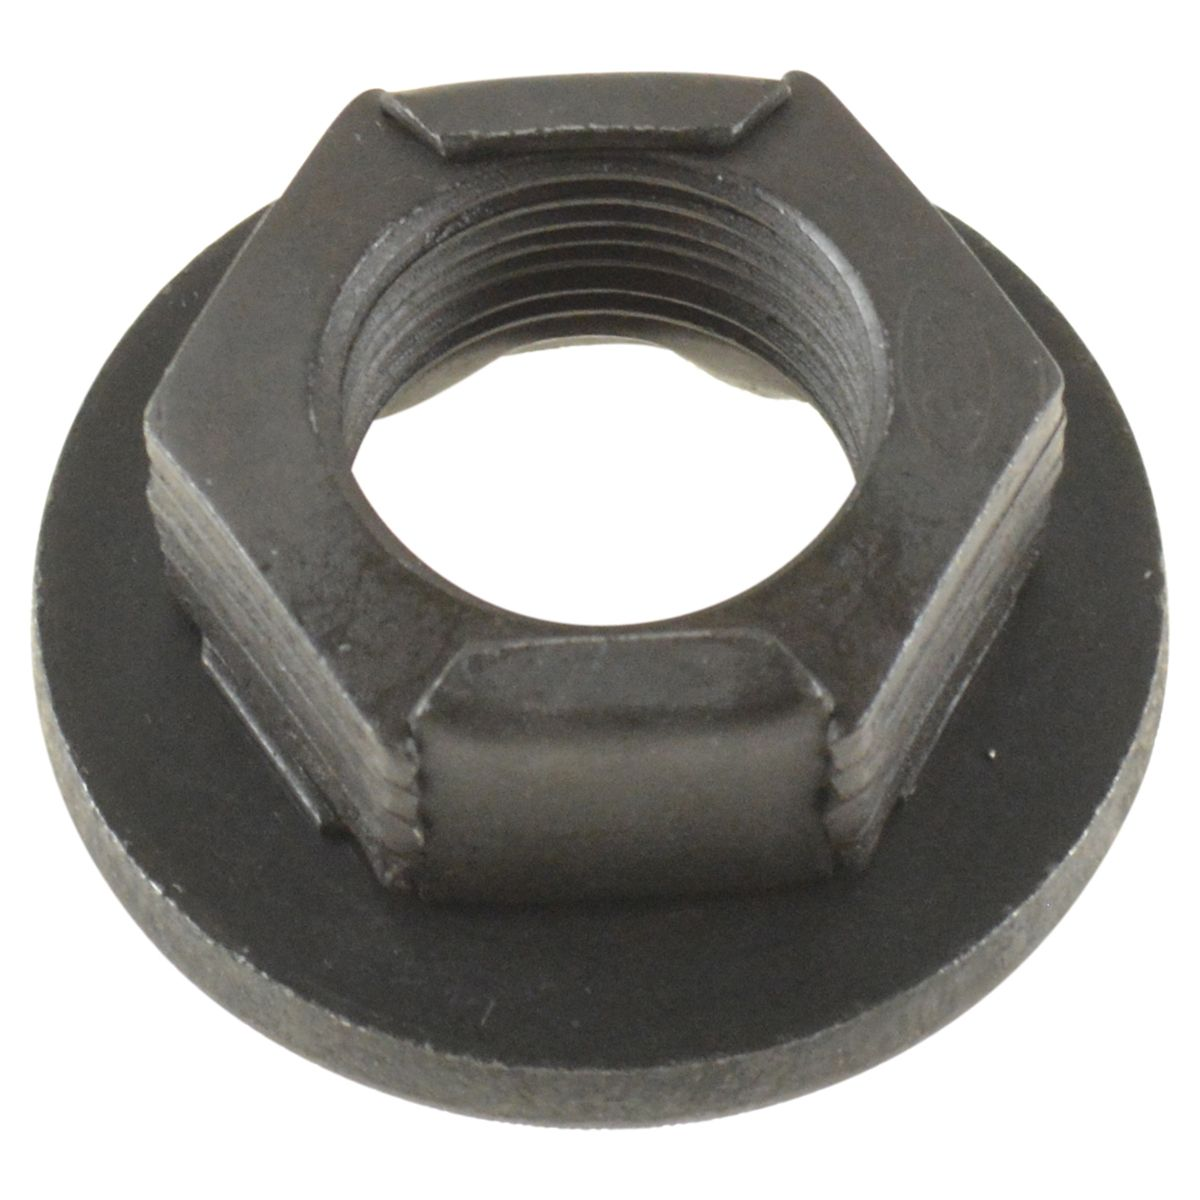 10-24 steel zinc insert black pp Innovative Components AN04-B1-L-21 1.00 Ball knob Pack of 10